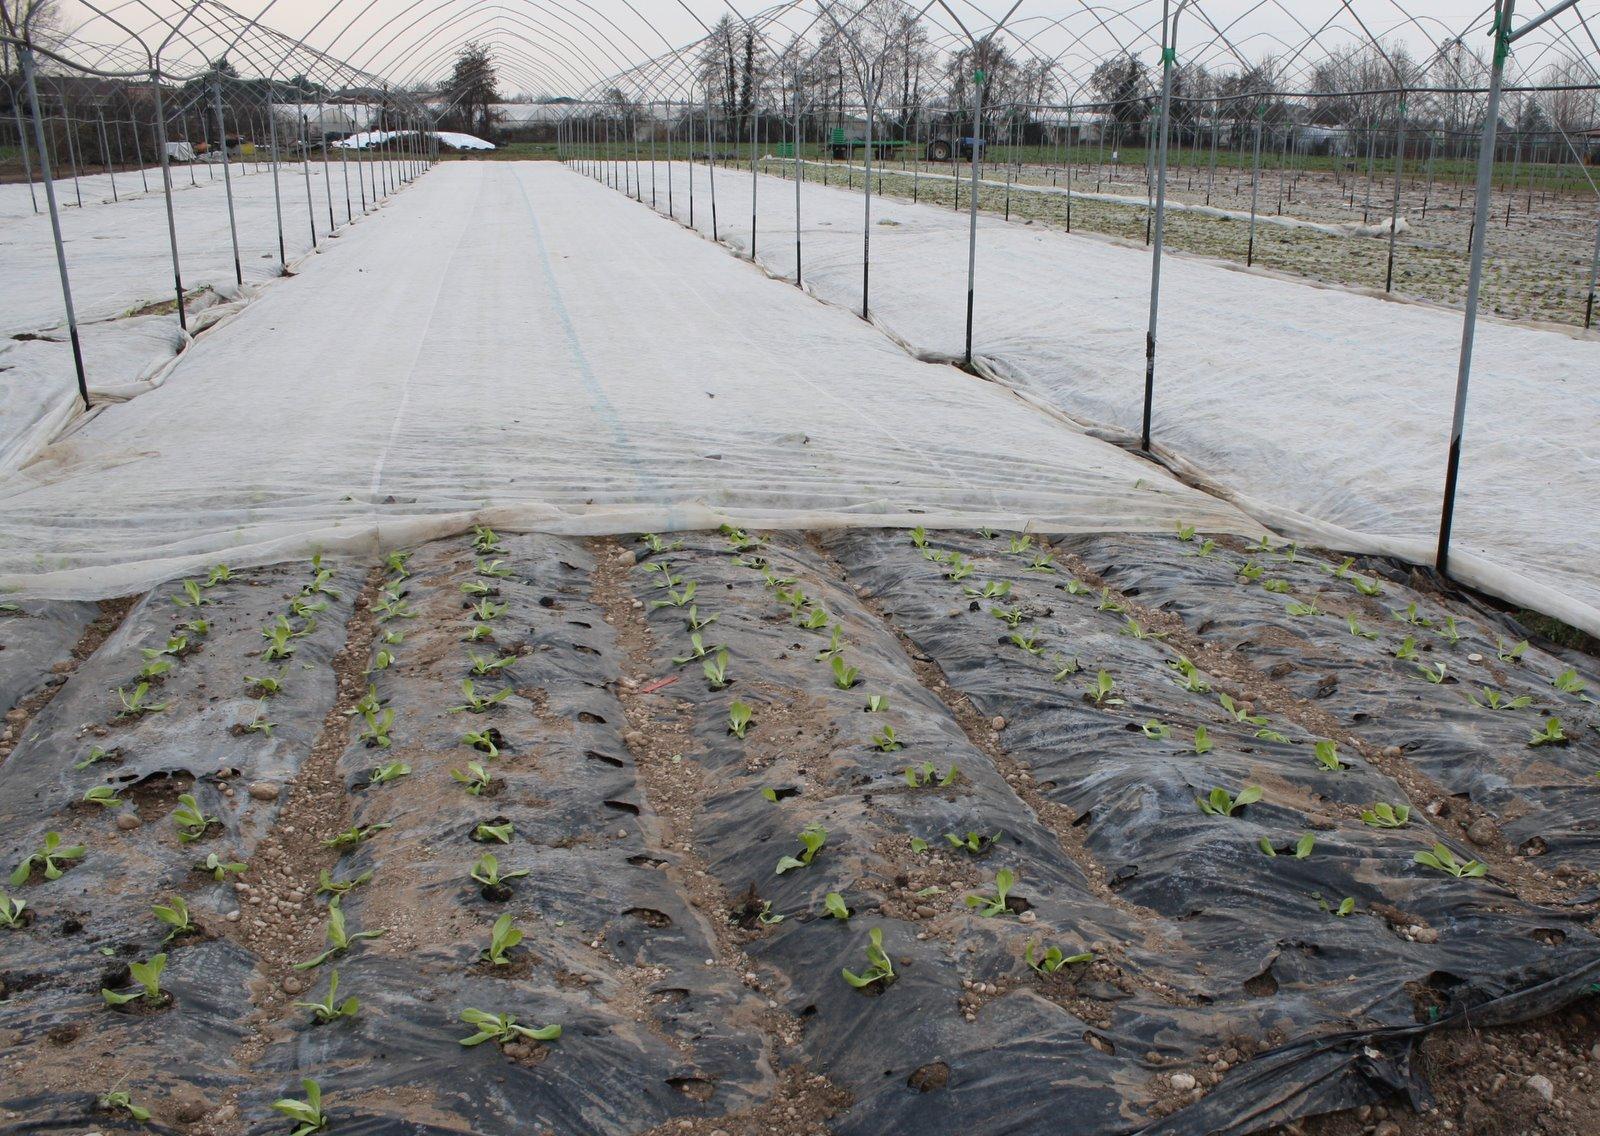 losmogotes: agricoltura industriale